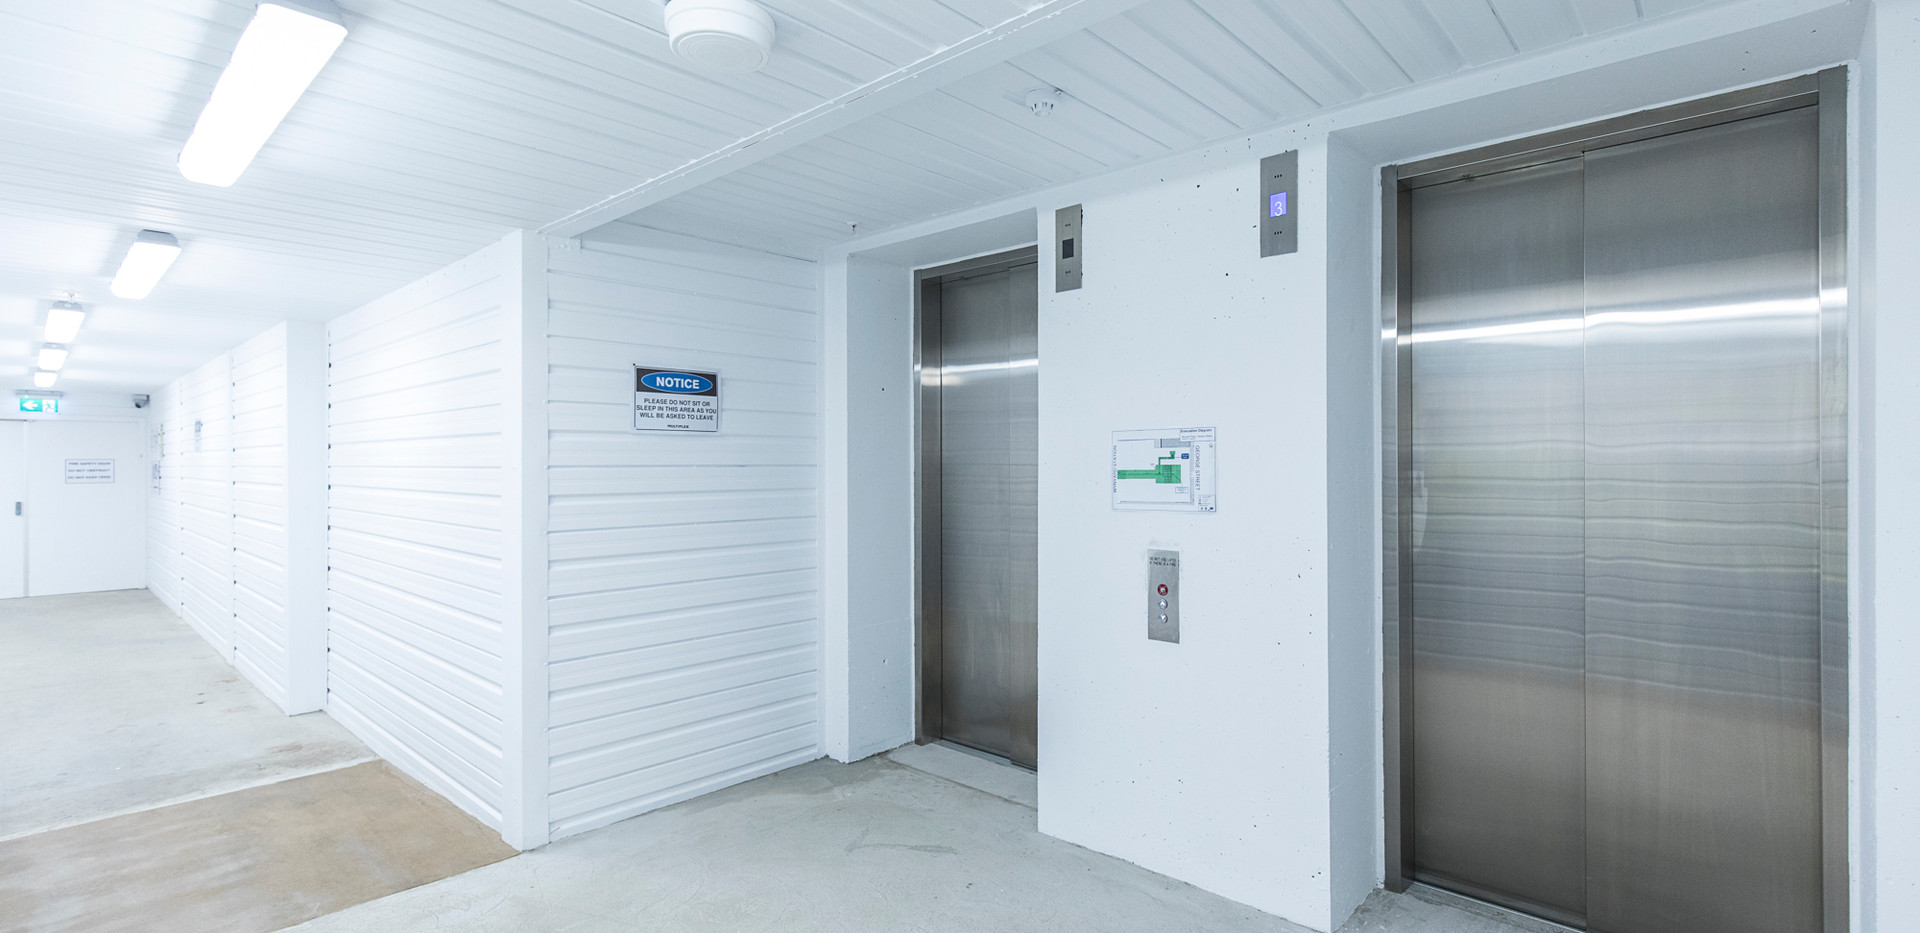 060 dda lifts at concourse (1).jpg